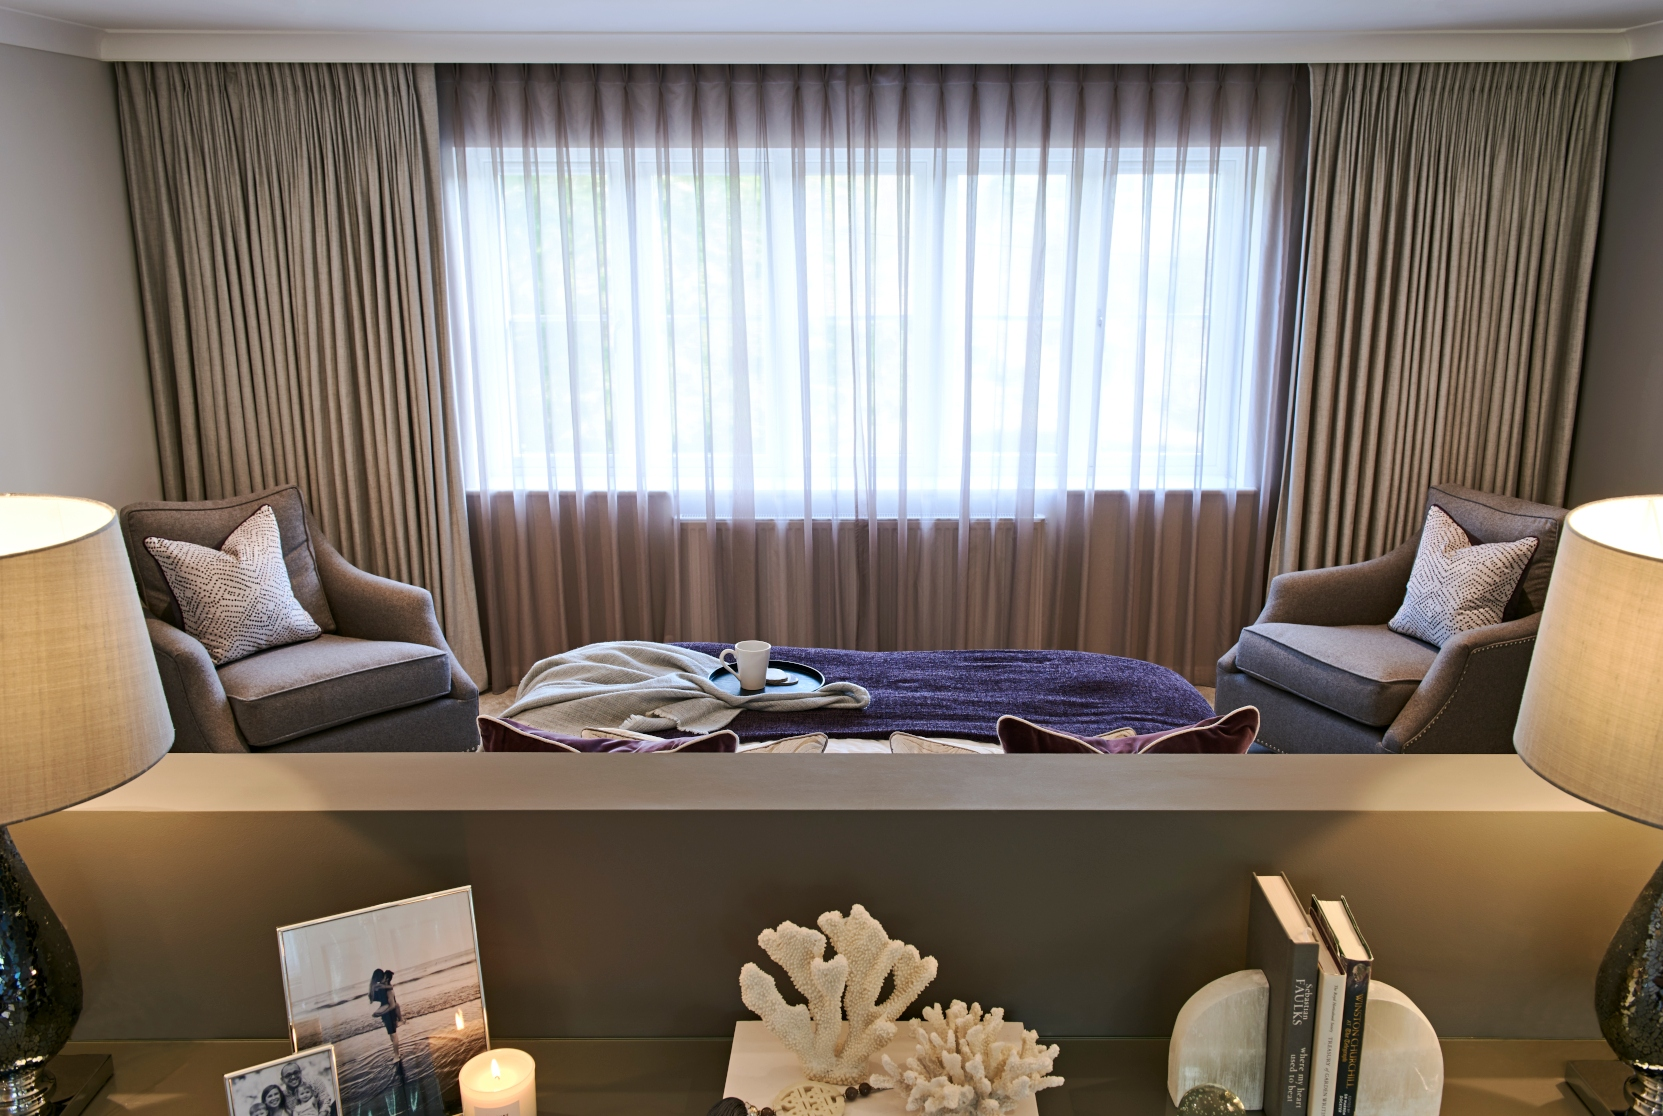 Stud wall & curtains in master bedroom - Interior design